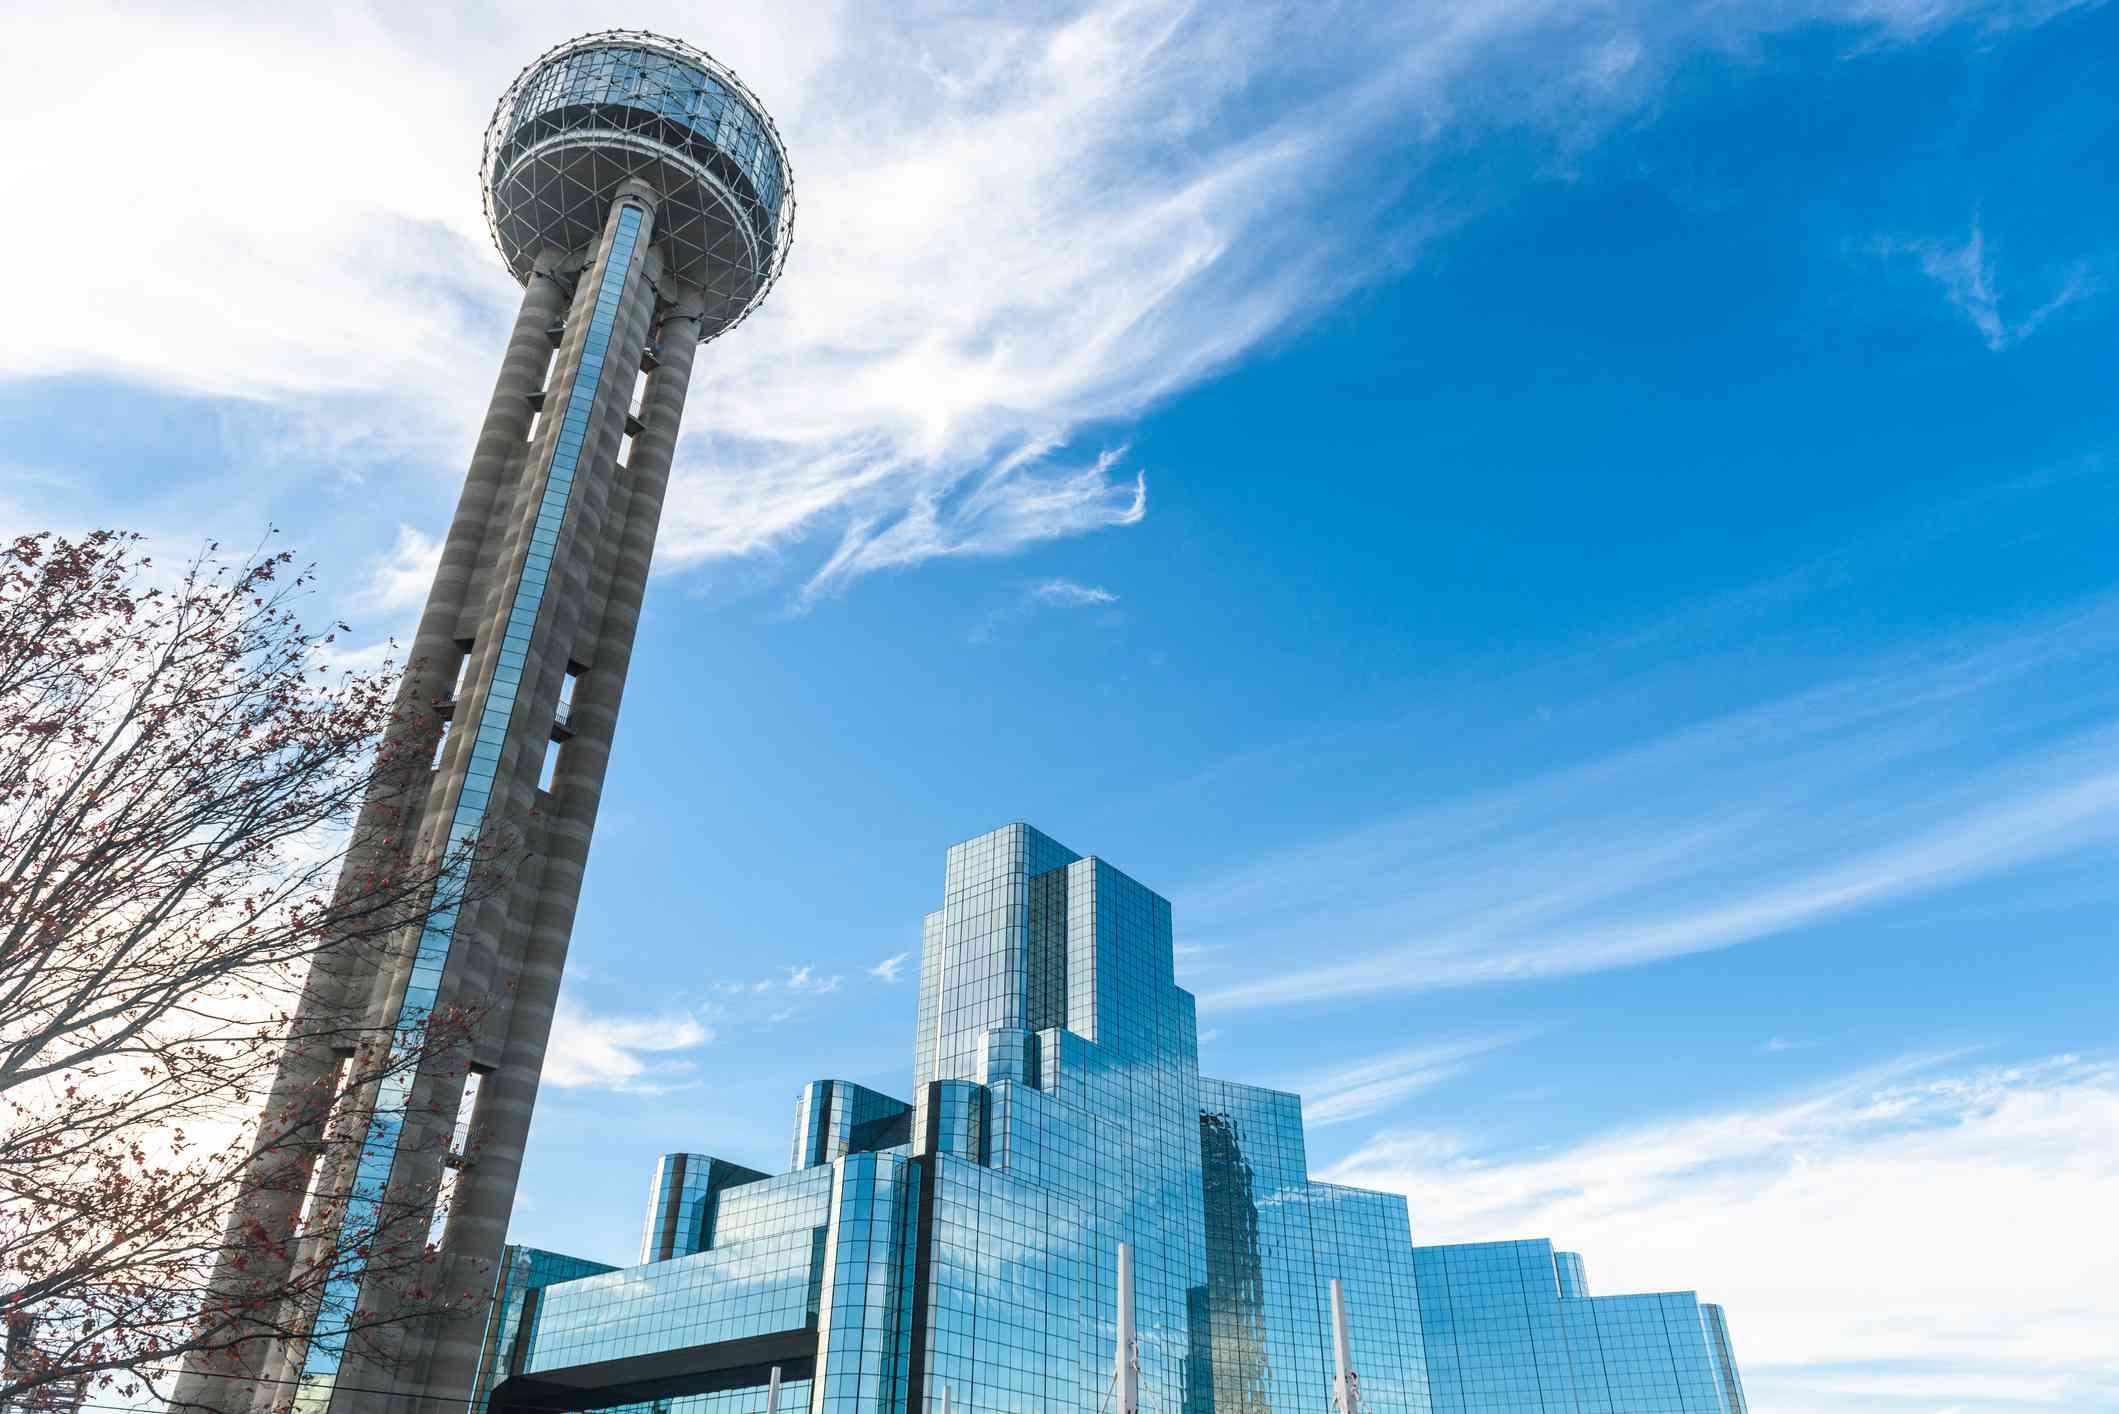 Dallas skyline with Reunion tower